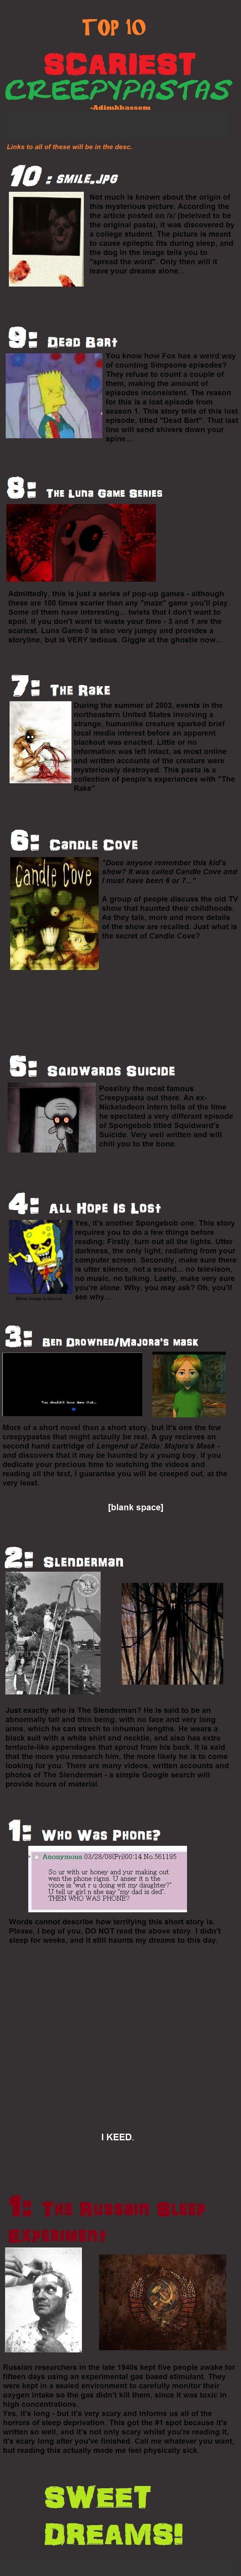 Top 10 Creepypastas. Smile.jpg: knowyourmeme.com/memes/smilejpg#.Tquaed4r2so Dead Bart: creepypasta.wikia.com/wiki/Dead_Bart The Luna Game Series: knowyourmeme.